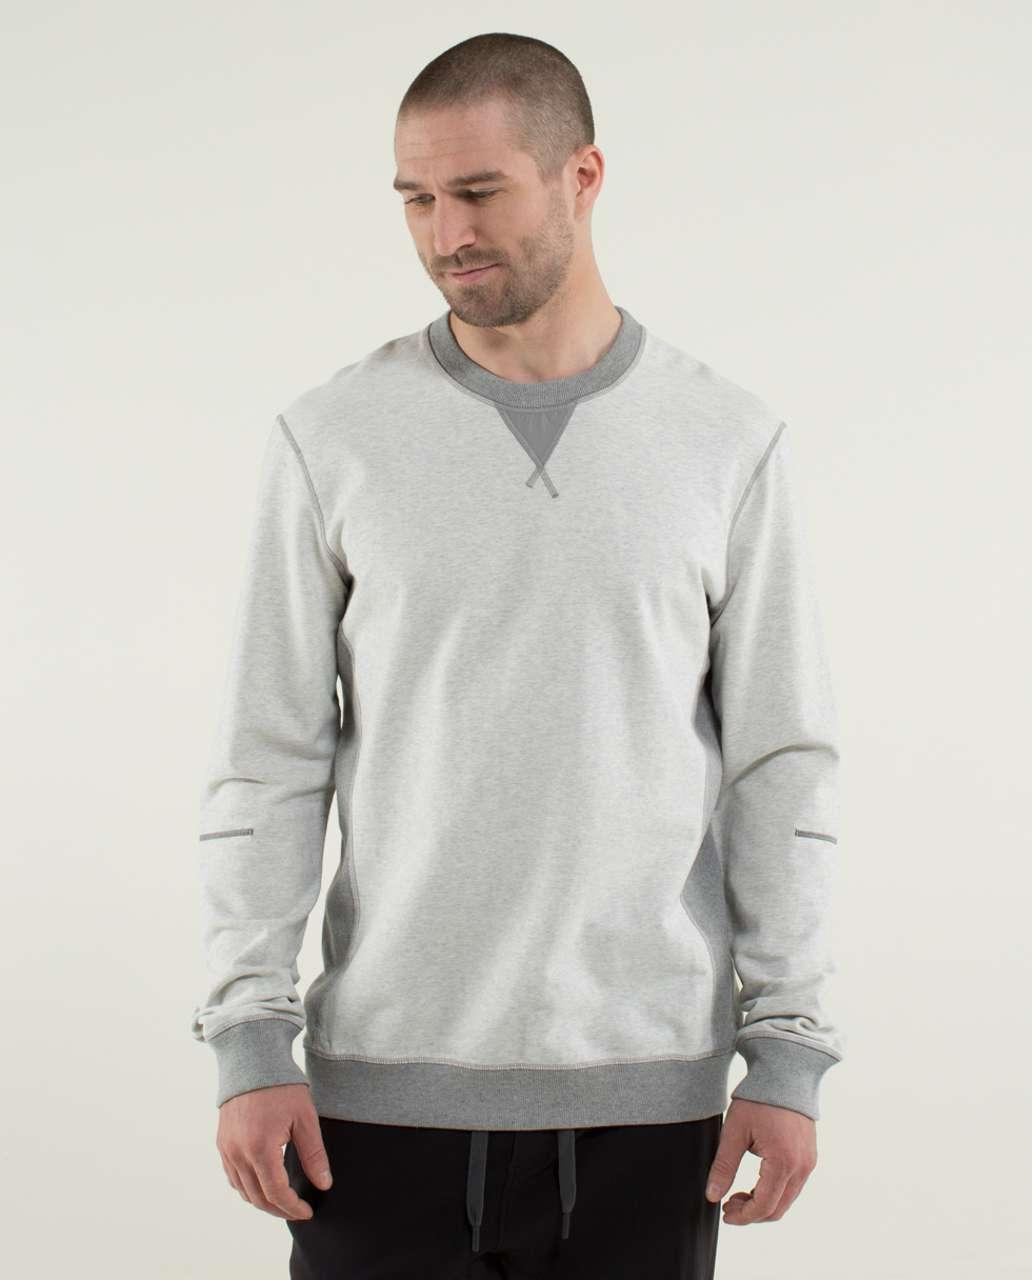 Lululemon All Town Crew Long Sleeve - Heathered White / Heathered Medium Grey